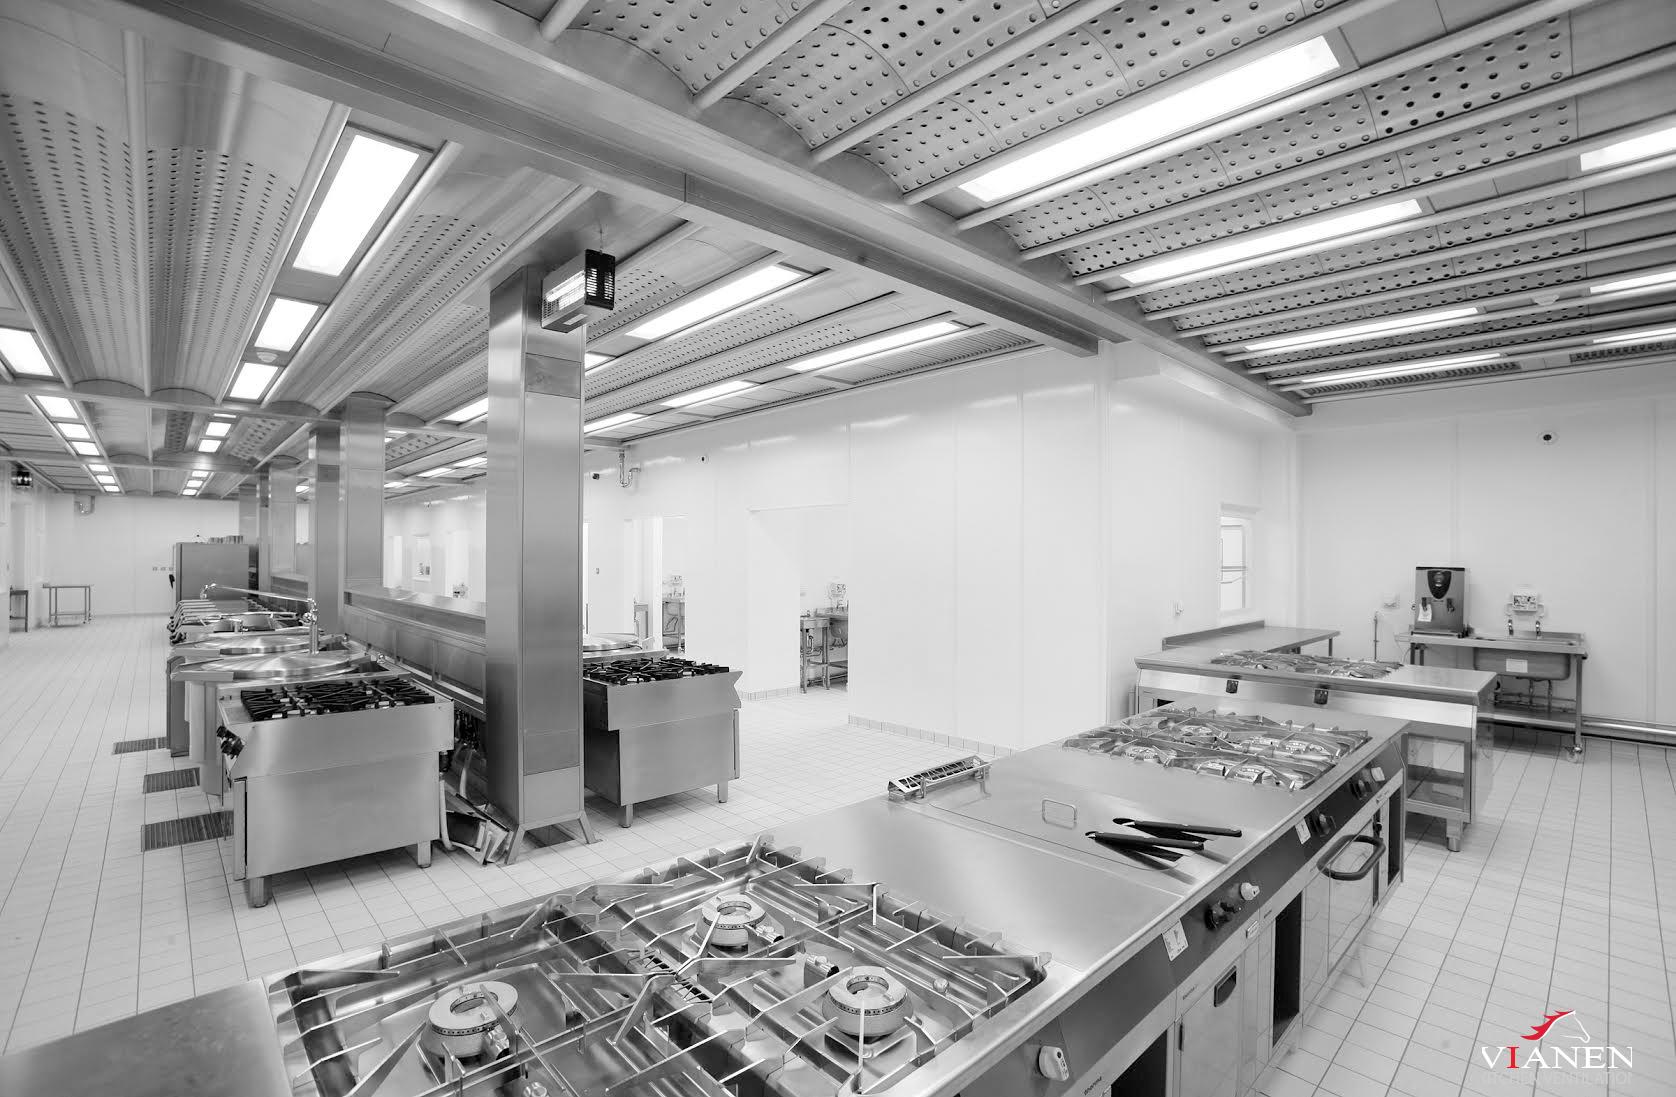 commercial kitchen ventilation cabinets charleston sc spantile ceiling - vianenkvs.com